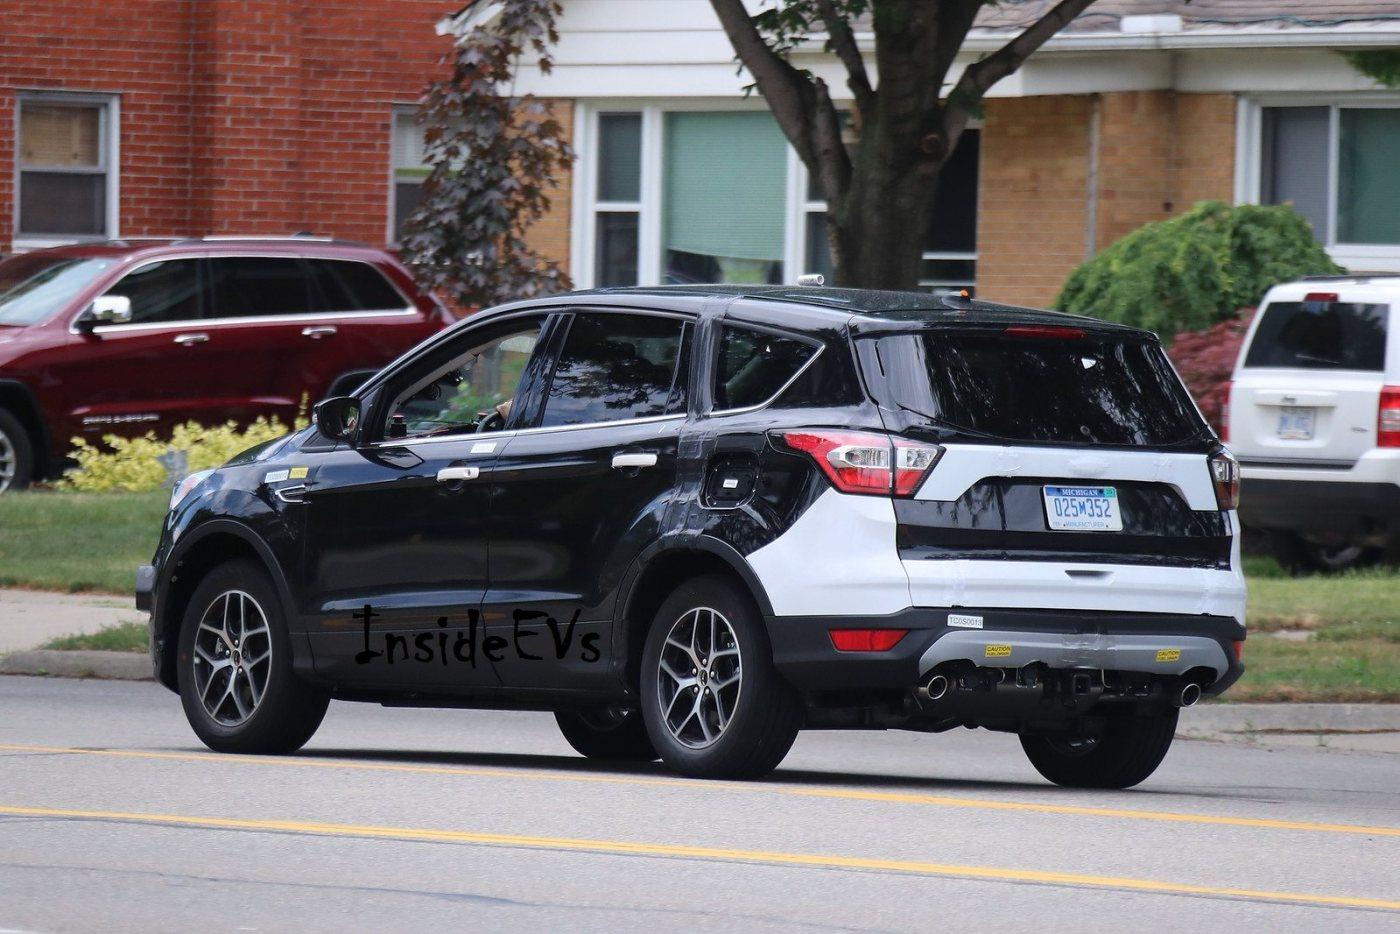 Ford-Escape-standard-spyshots-2-automedia.jpg